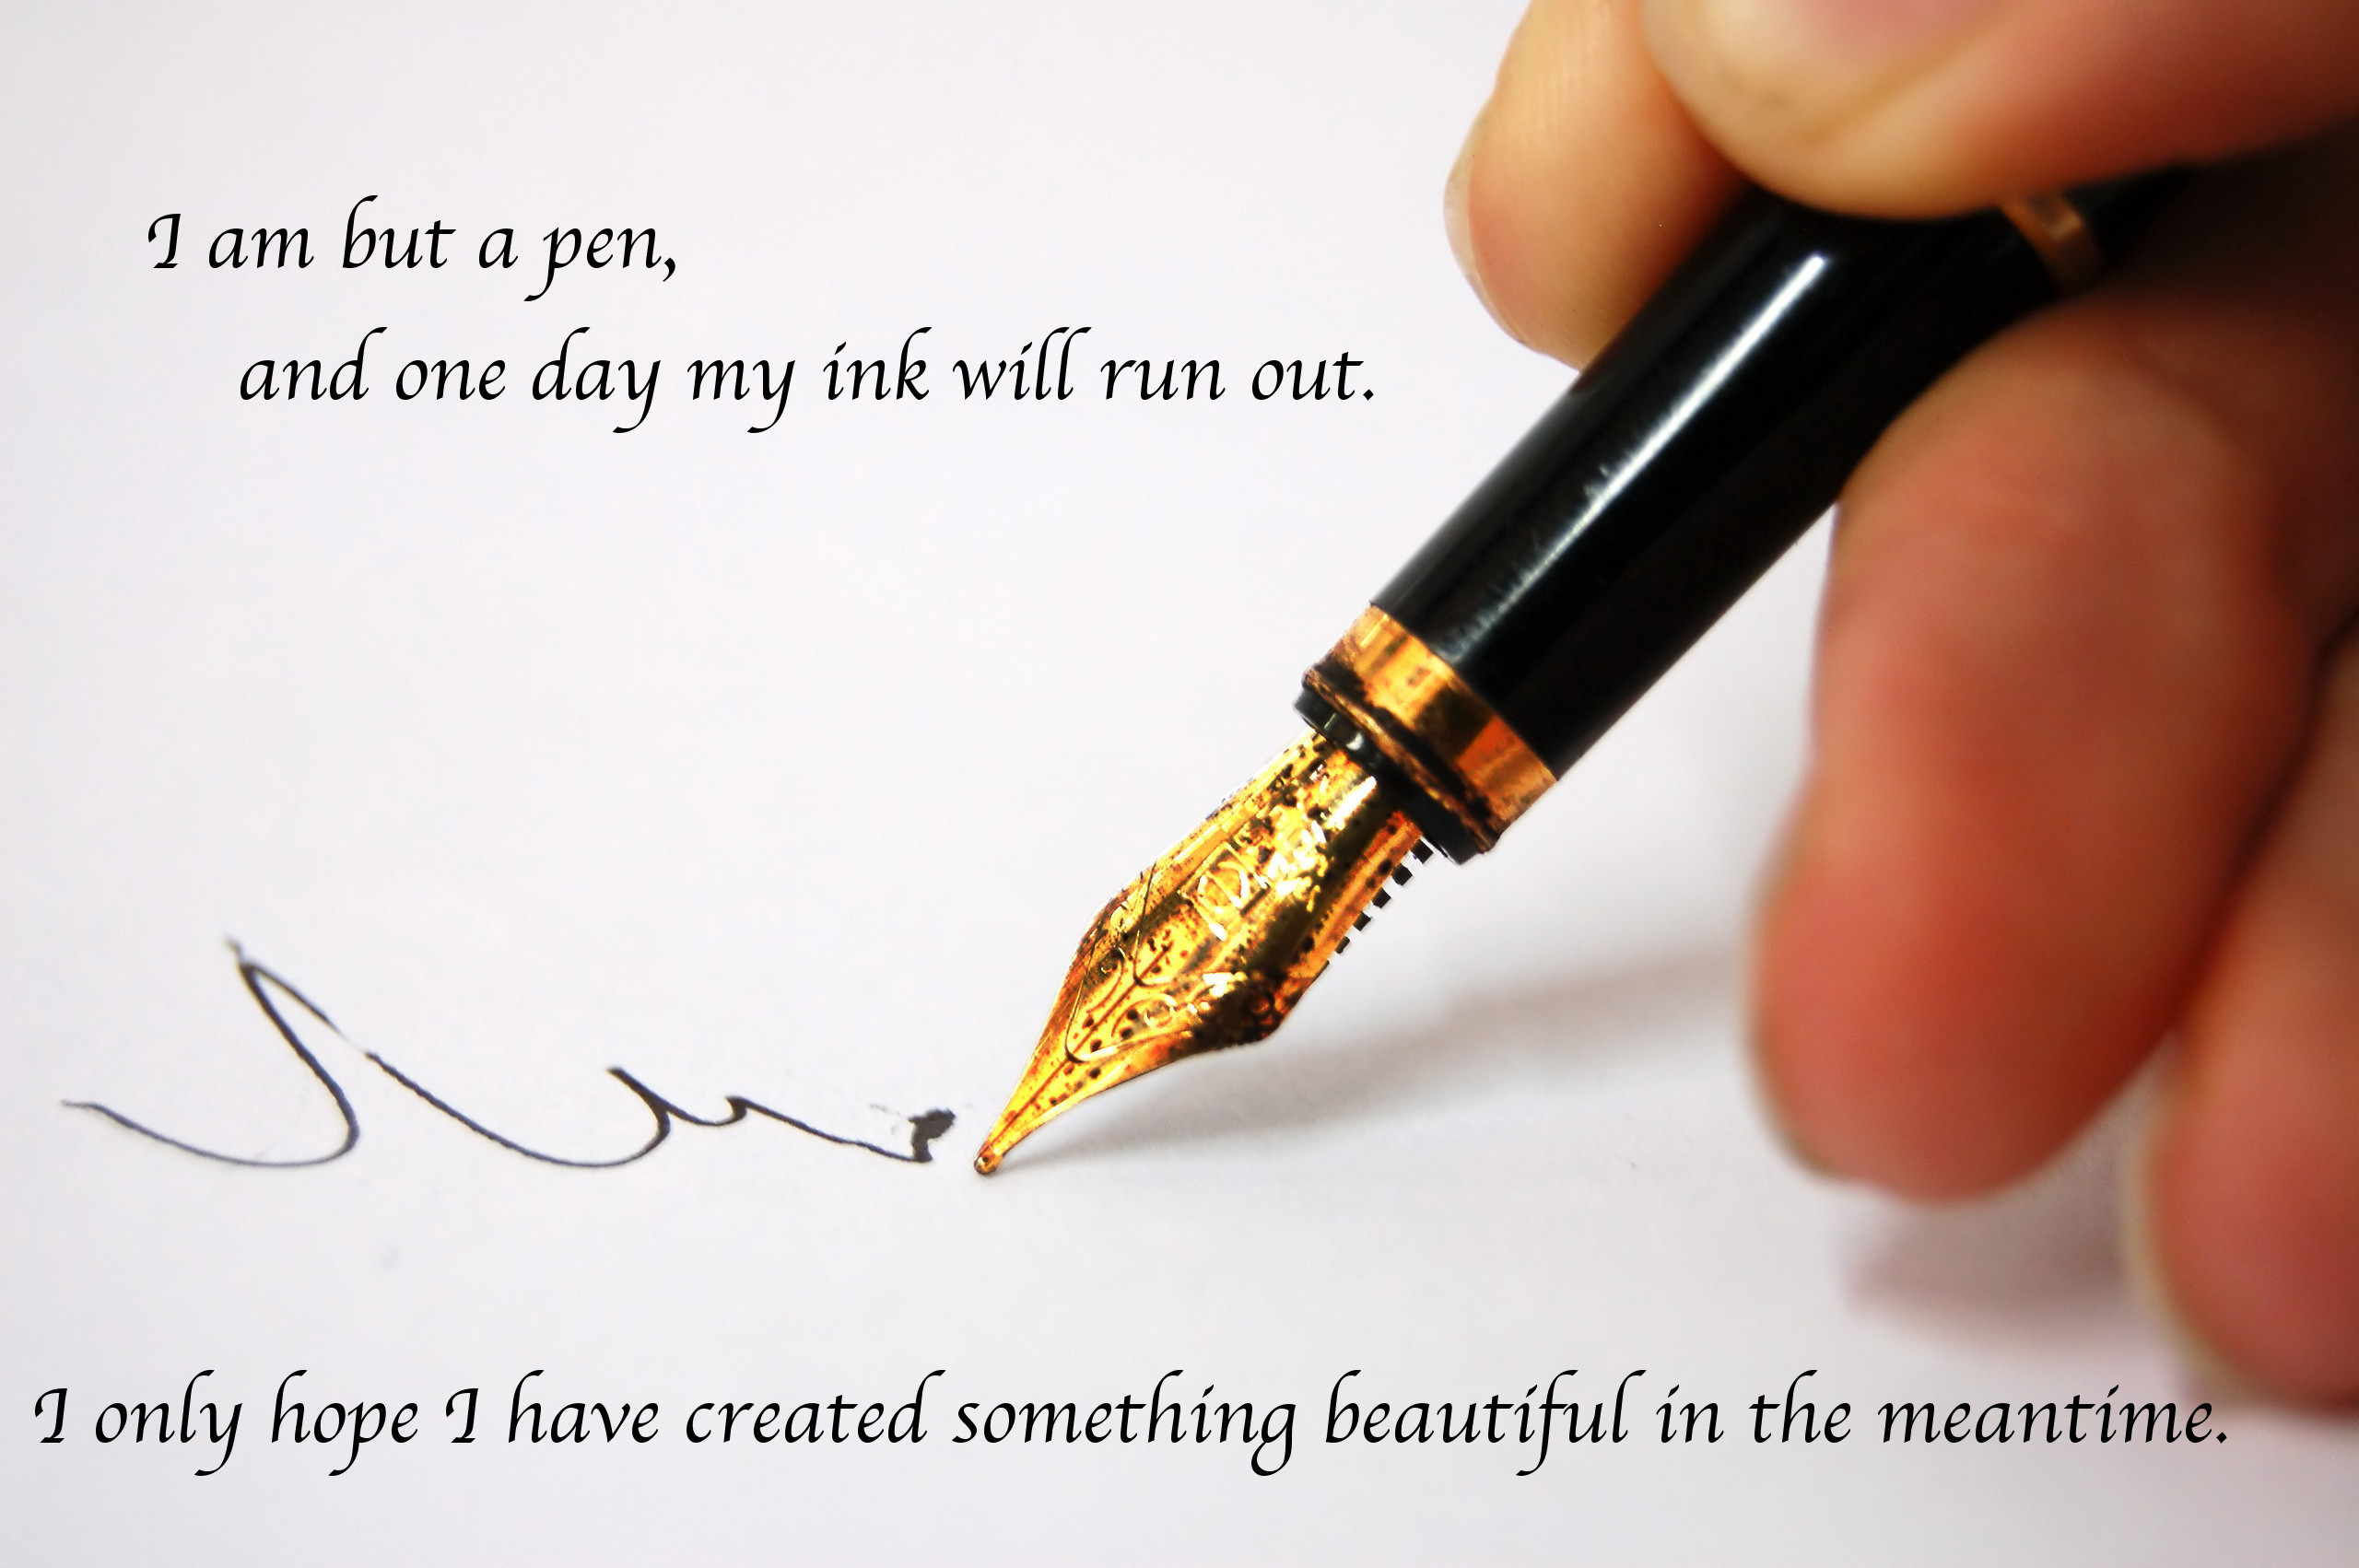 Pen quote #2